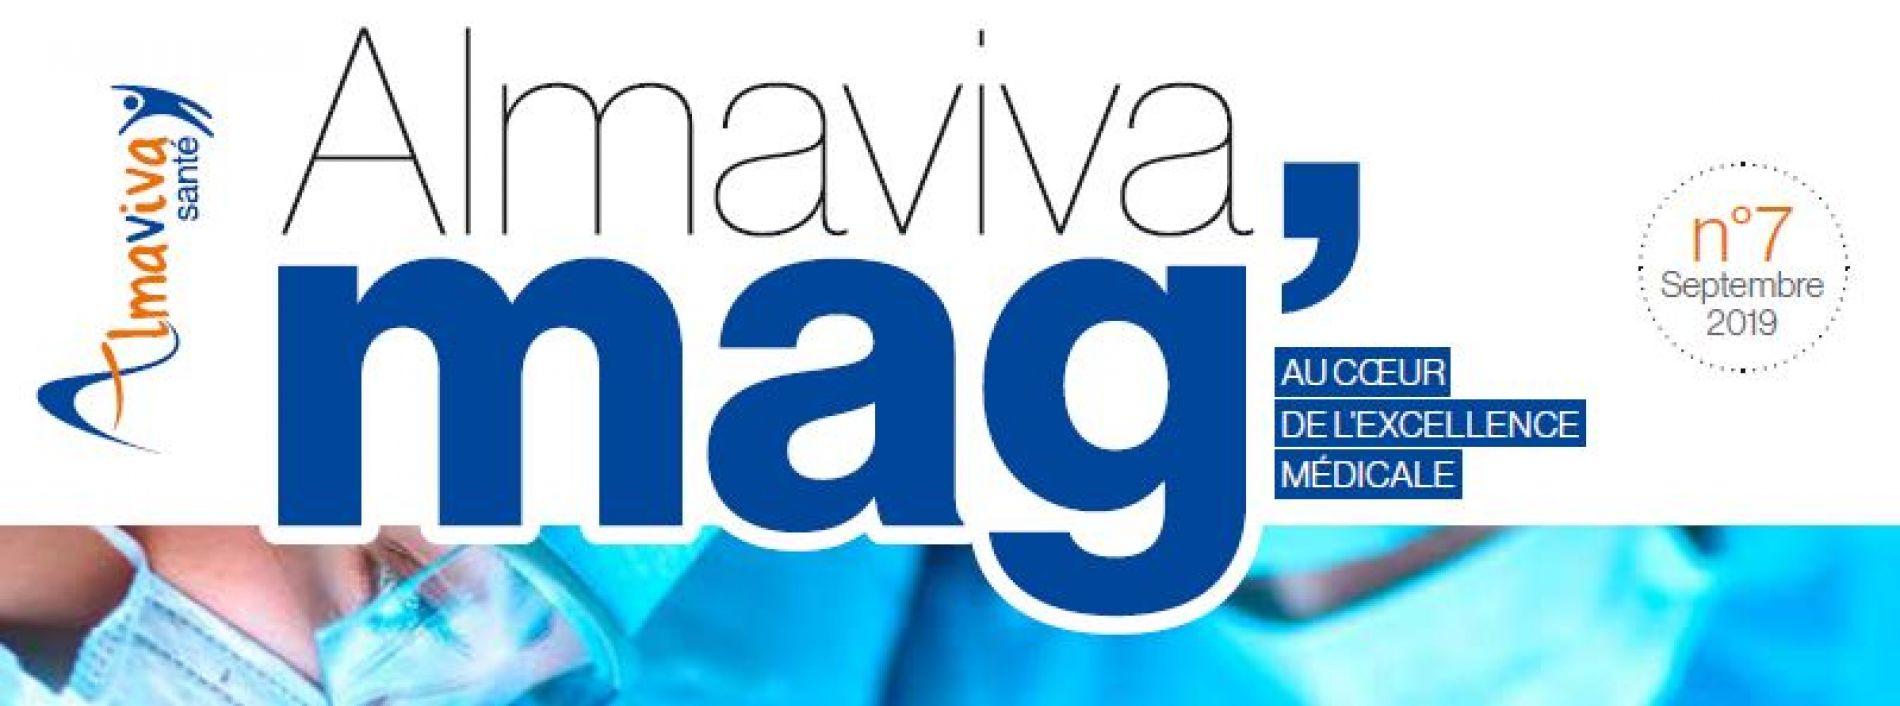 Magazine Almaviva Santé N°7 - Septembre 2019